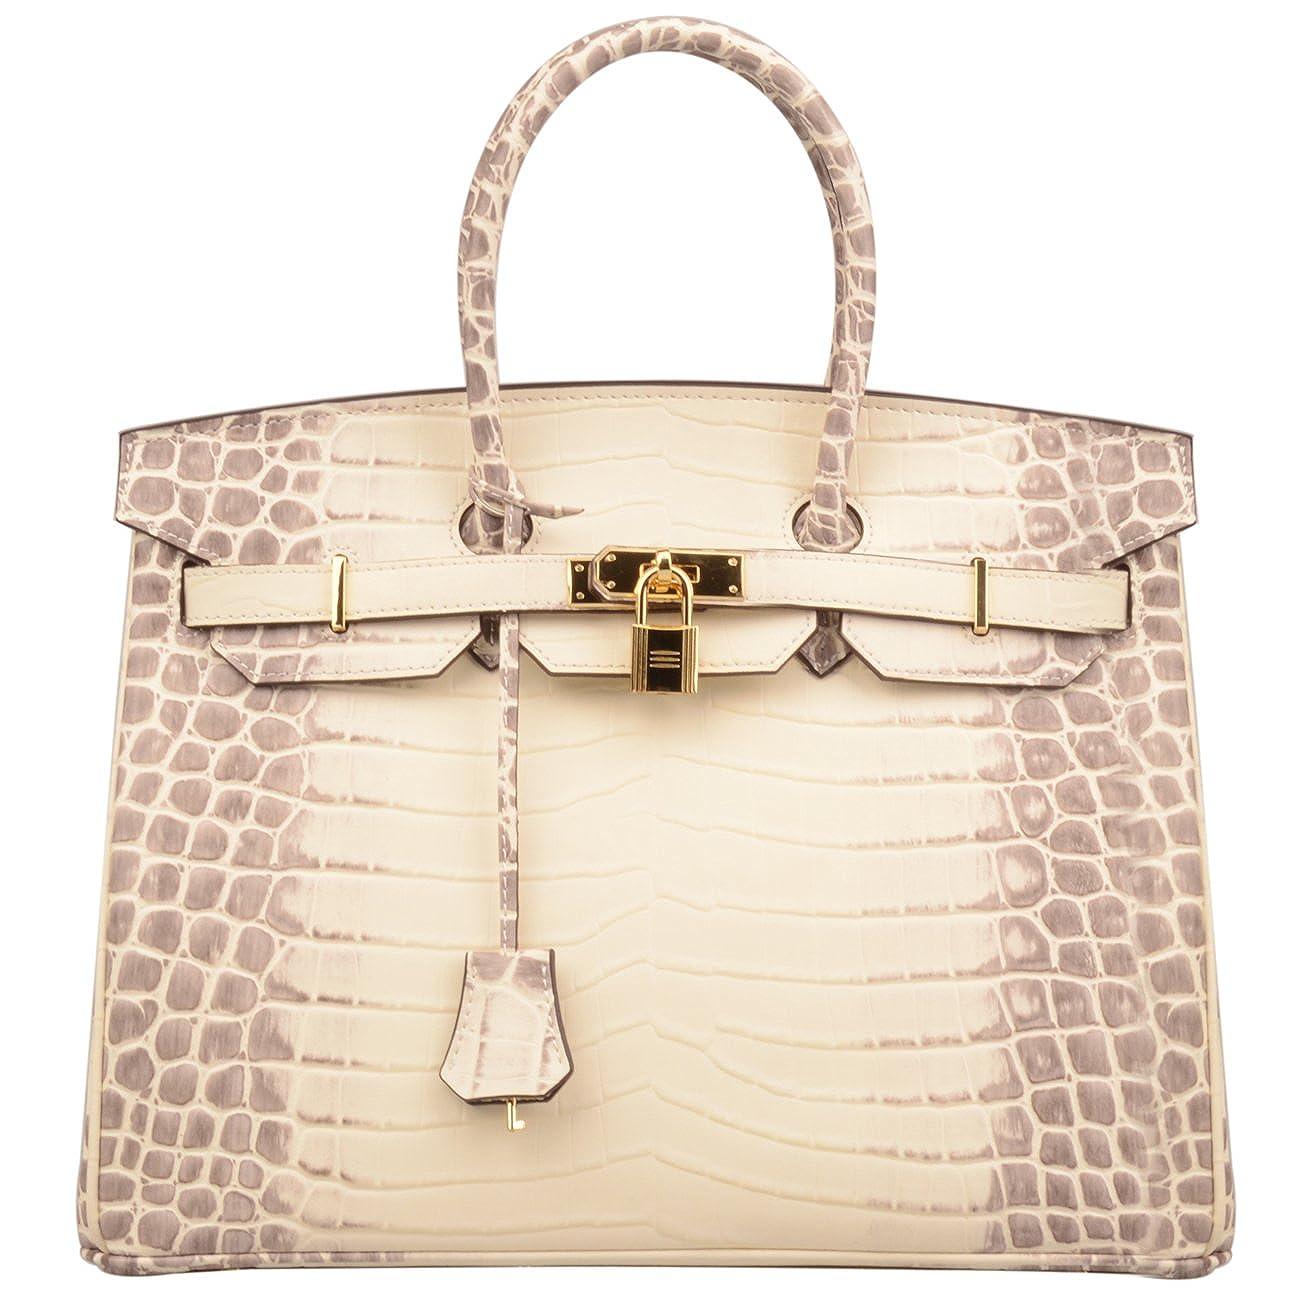 a574d0ef64f Ainifeel Women s Patent Leather Crocodile Embossed Handbags Top Handle  Purse  Handbags  Amazon.com